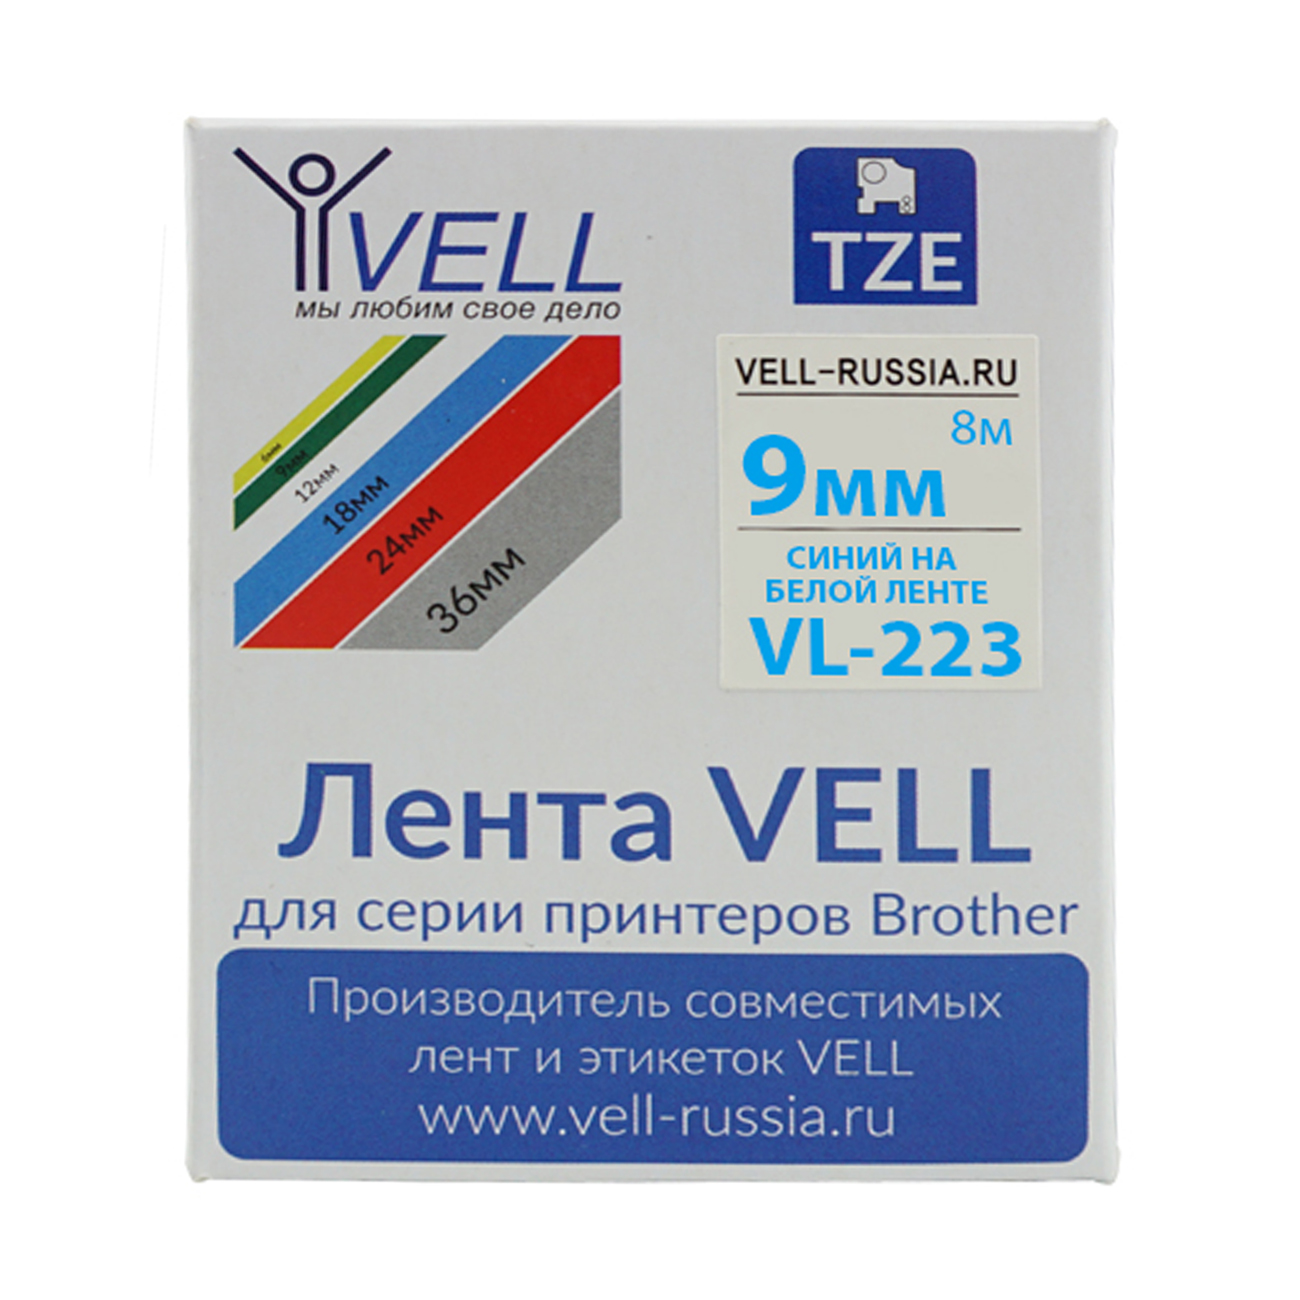 Фото Лента Vell VL-223 (9 мм, синий на белом) для PT 1010/1280/D200/H105/E100/ D600/E300/2700/ P700/E550/9700 {Vell223}